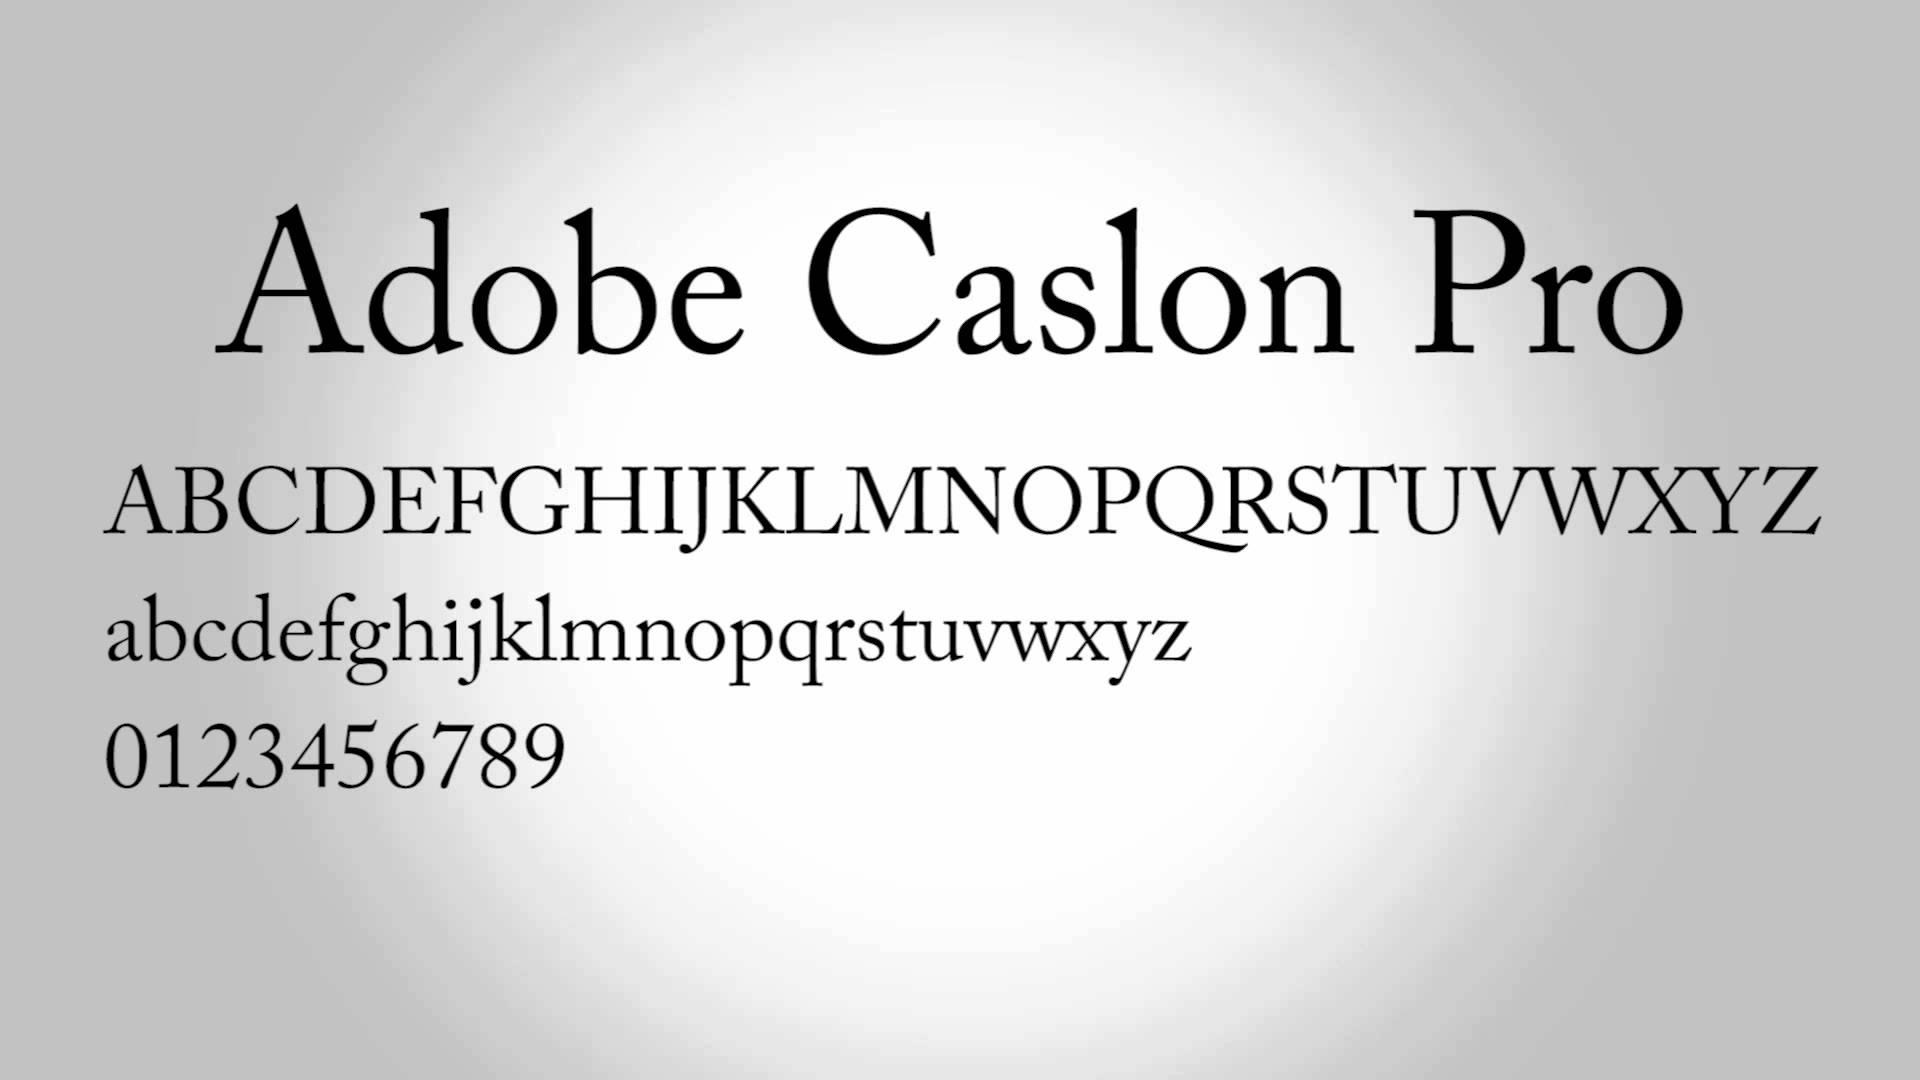 adobe caslon pro bold italic font free download